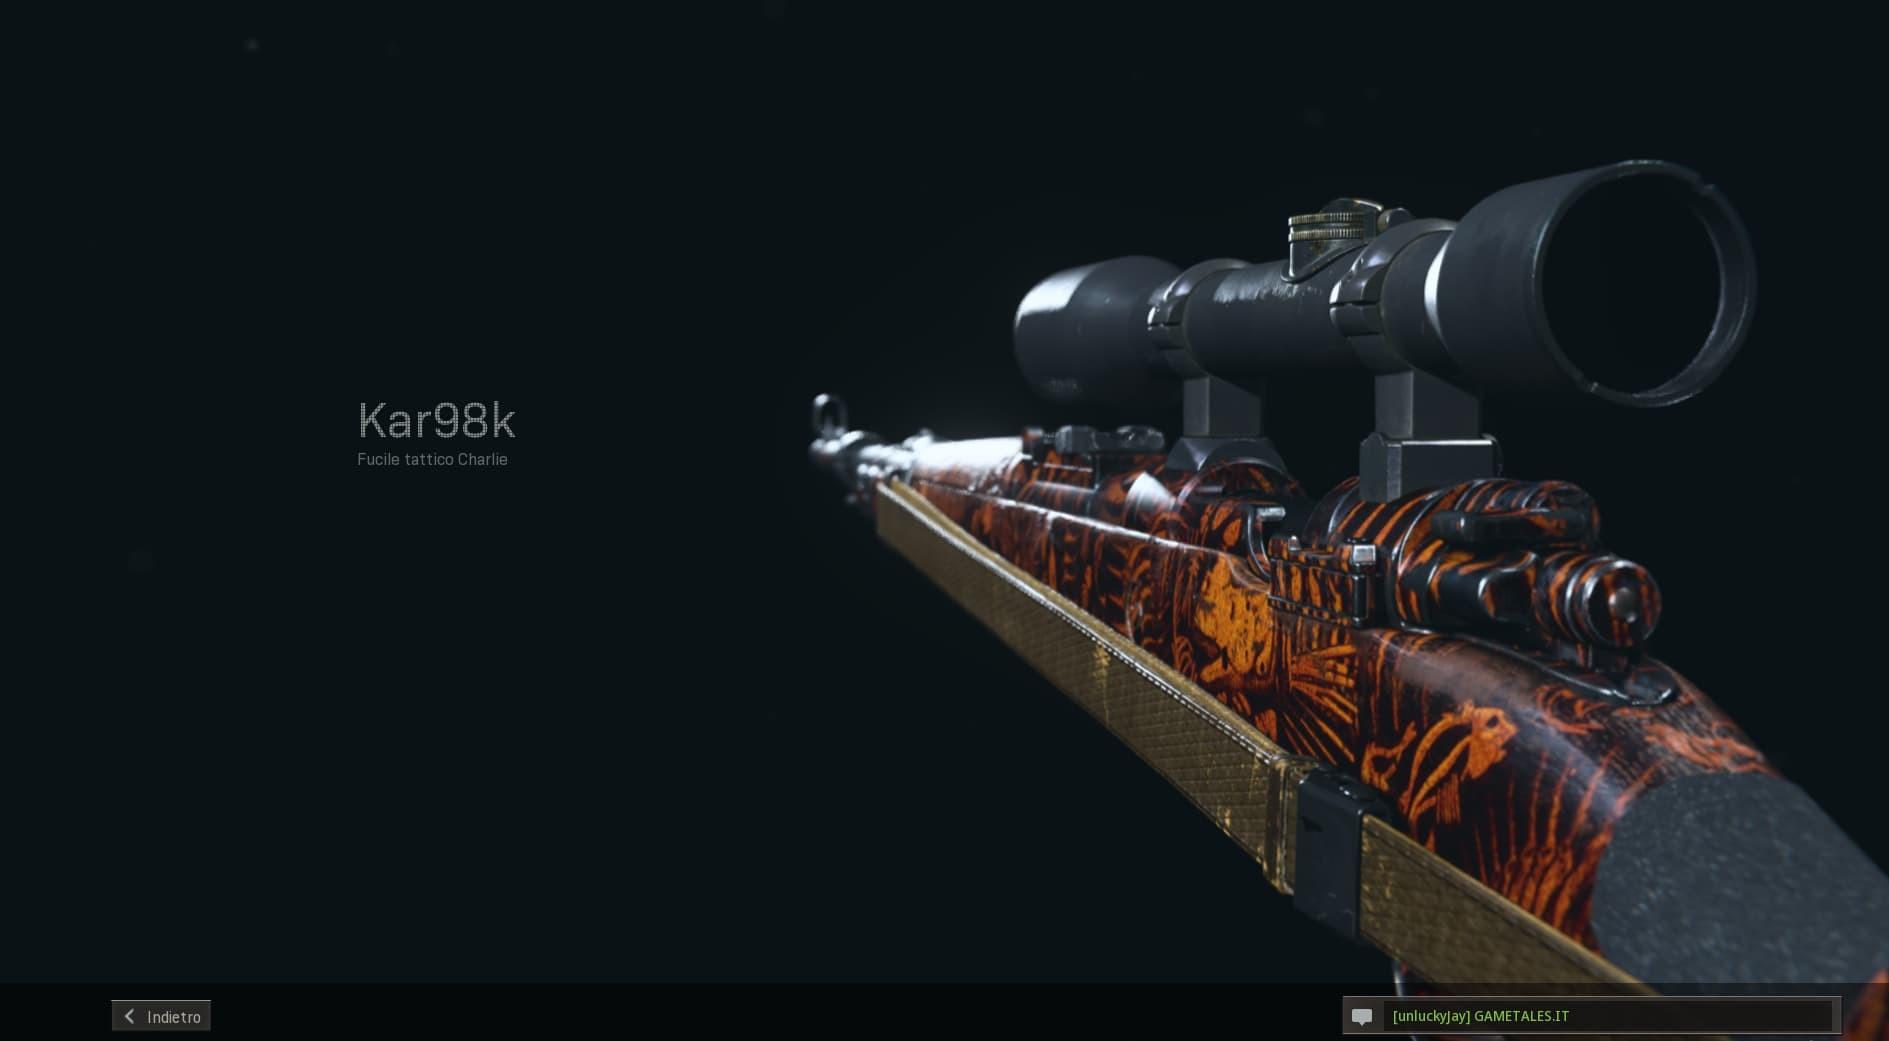 Call of Duty Warzone Build kar98k gmt anteprima